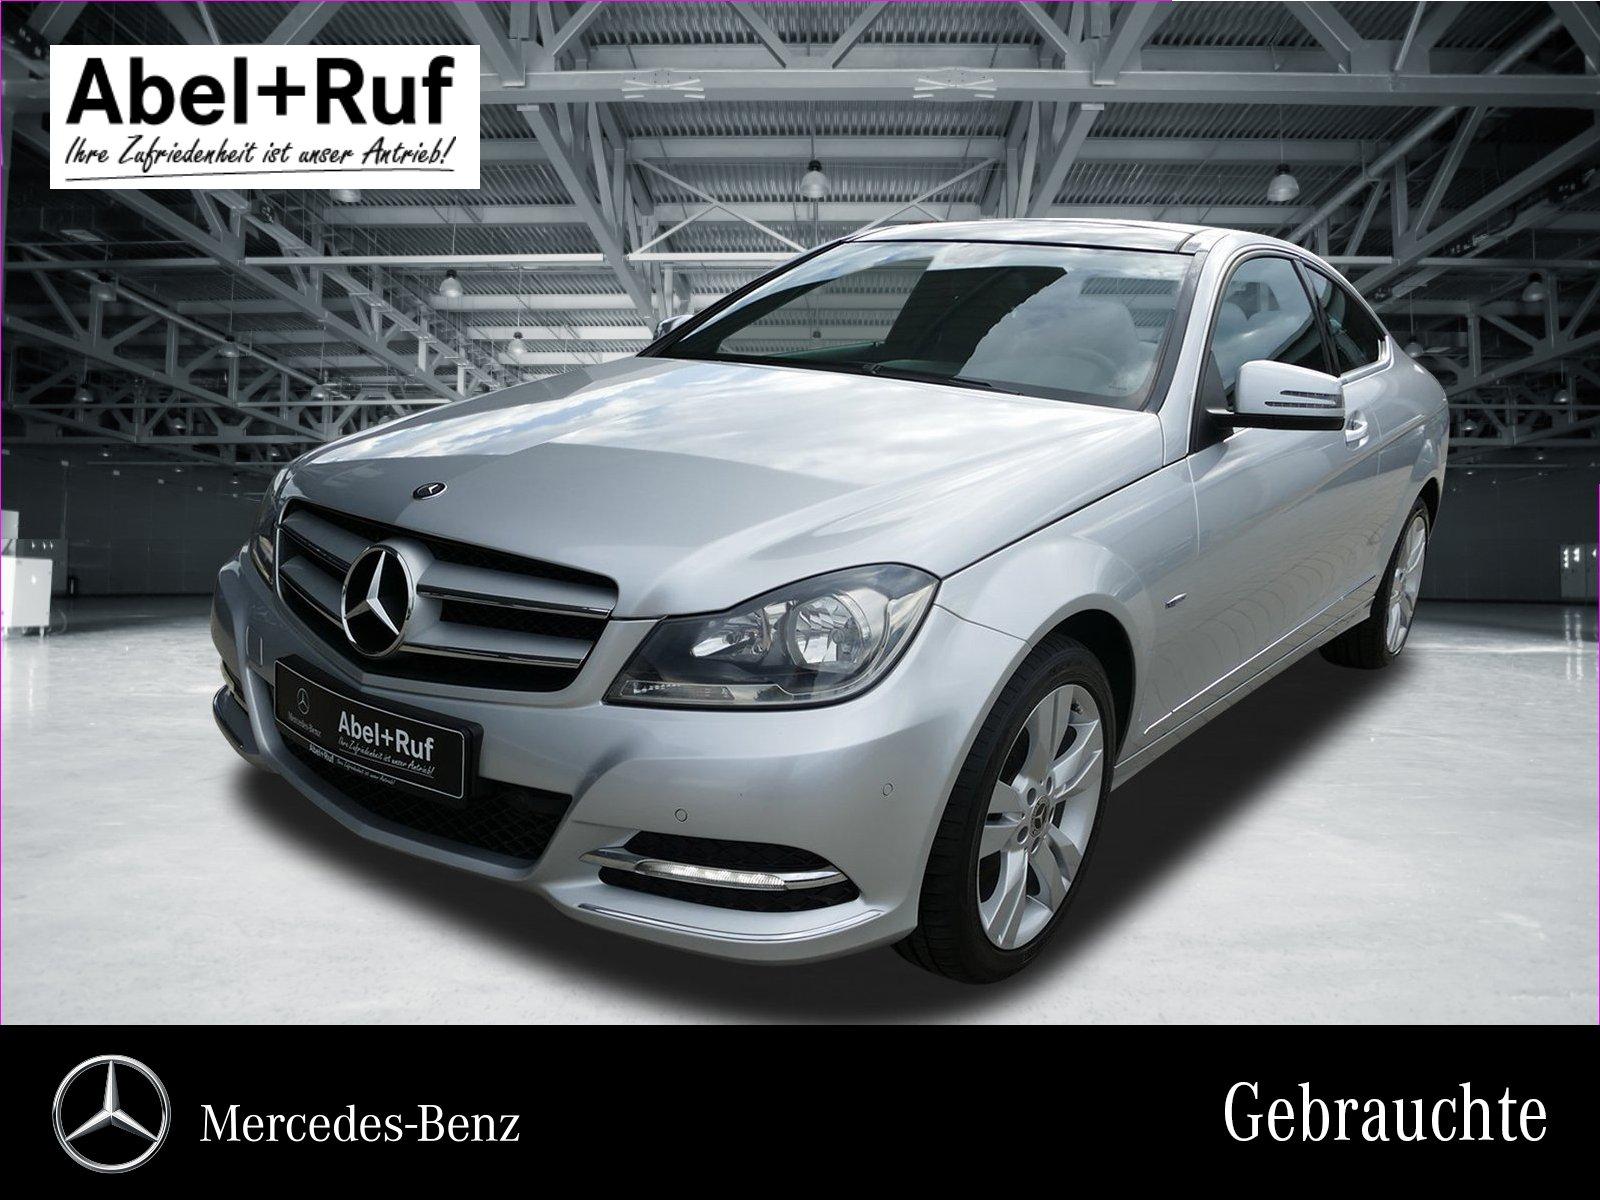 Mercedes-Benz C 250 CGI BlueEfficiency PDC+Panorama+Navi+Klima, Jahr 2012, petrol